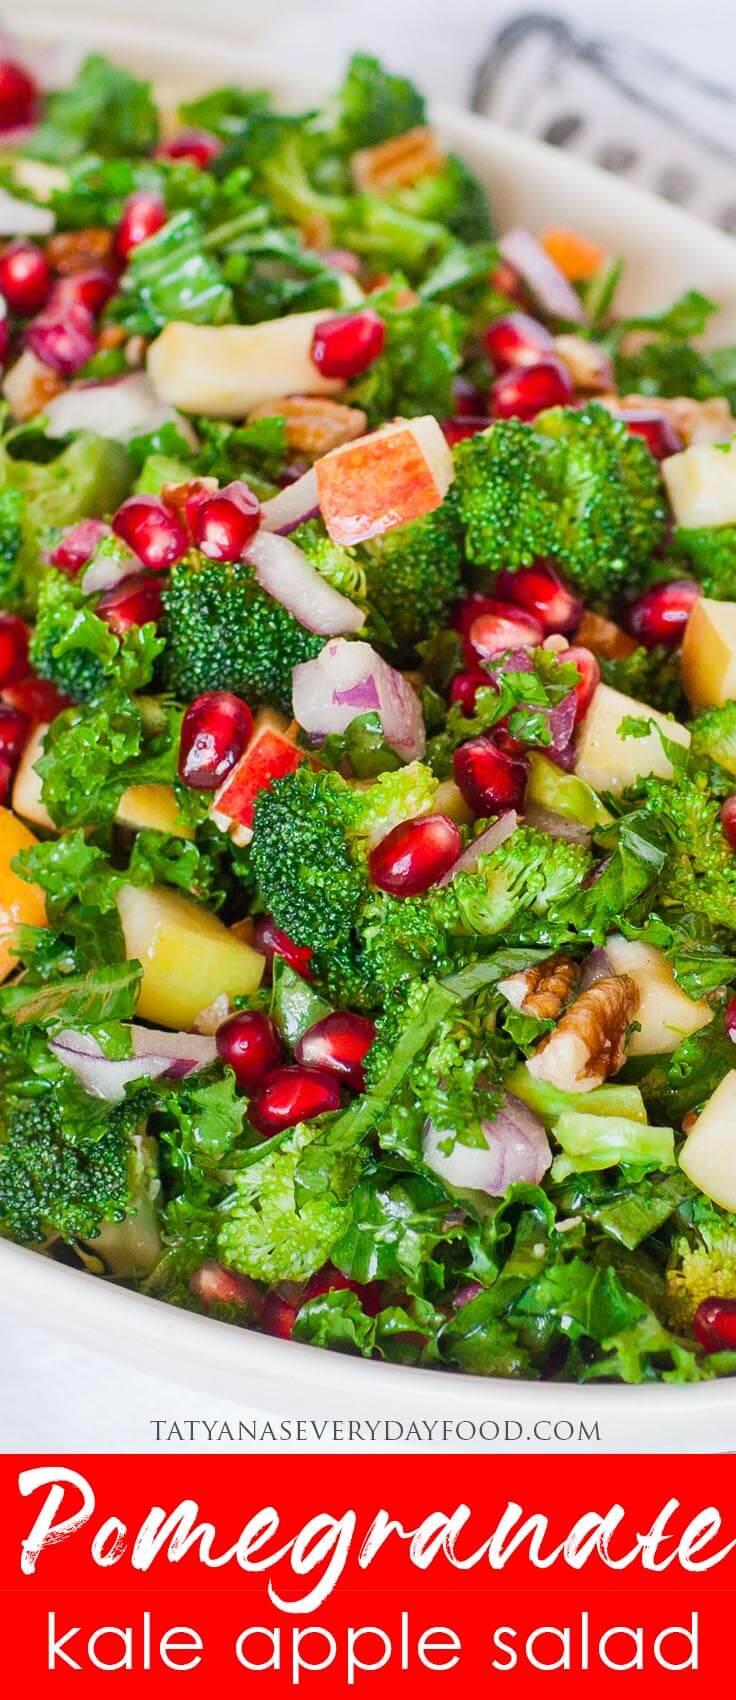 Easy Pomegranate Kale Salad recipe